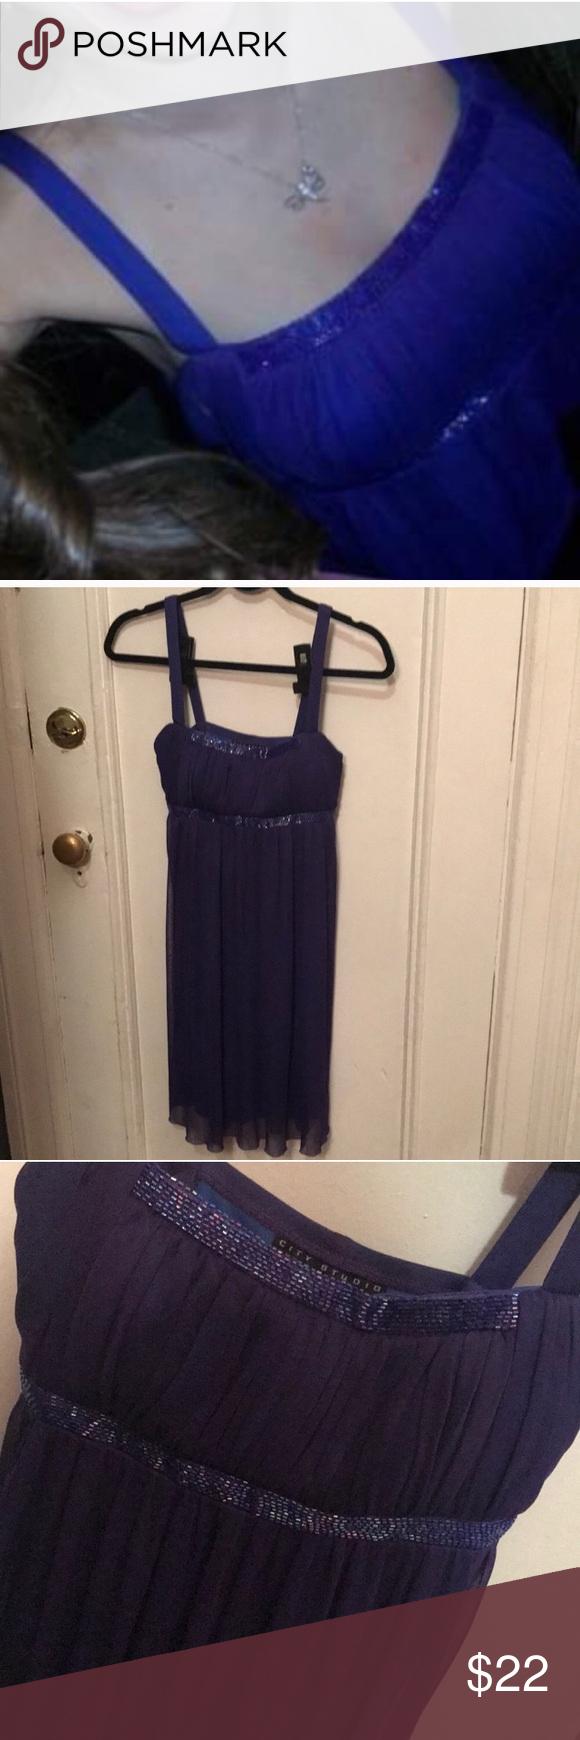 e824aae9d44 Blue jewel beaded prom mini dress small Macy s City studio brand Bought at  Macy s Beaded padded